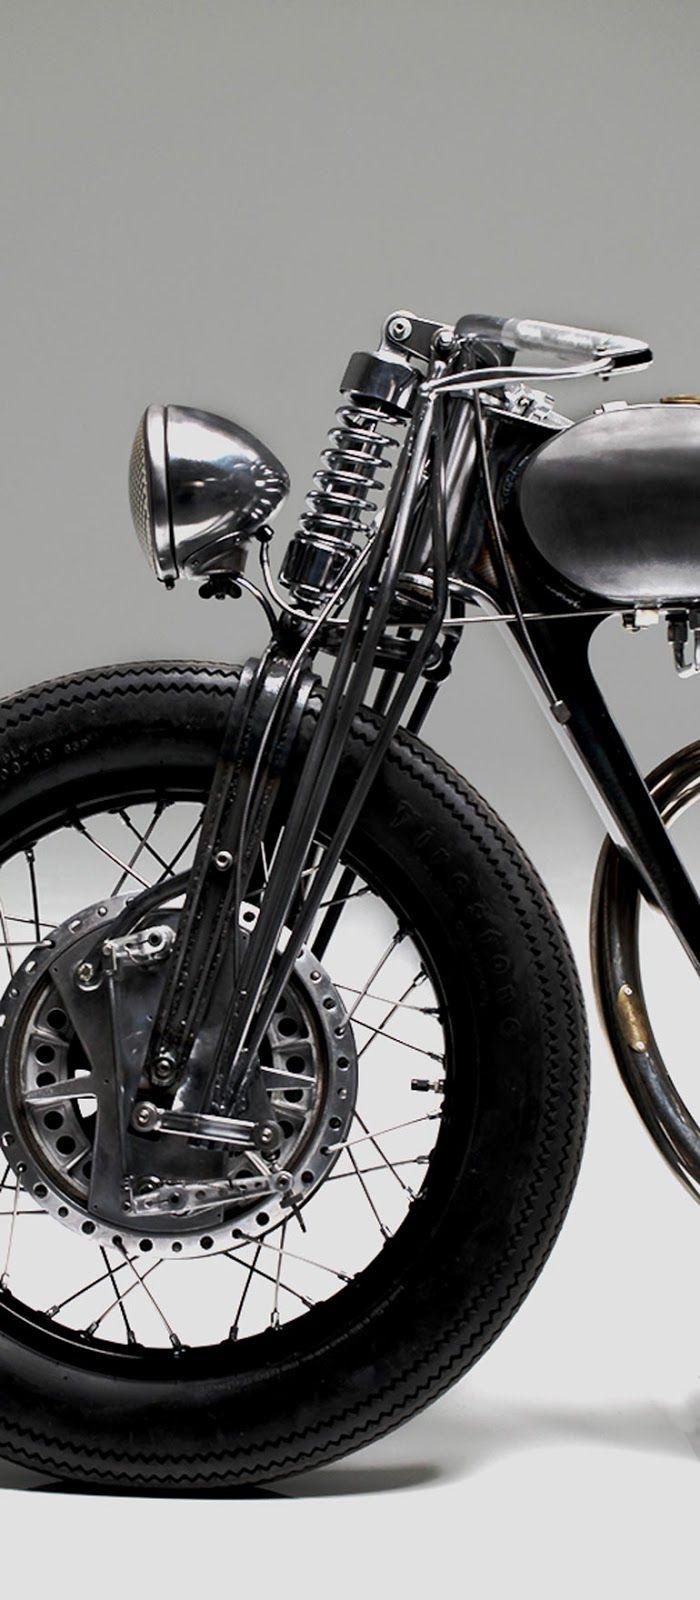 Old school design, - Girder front forks and drum brake can